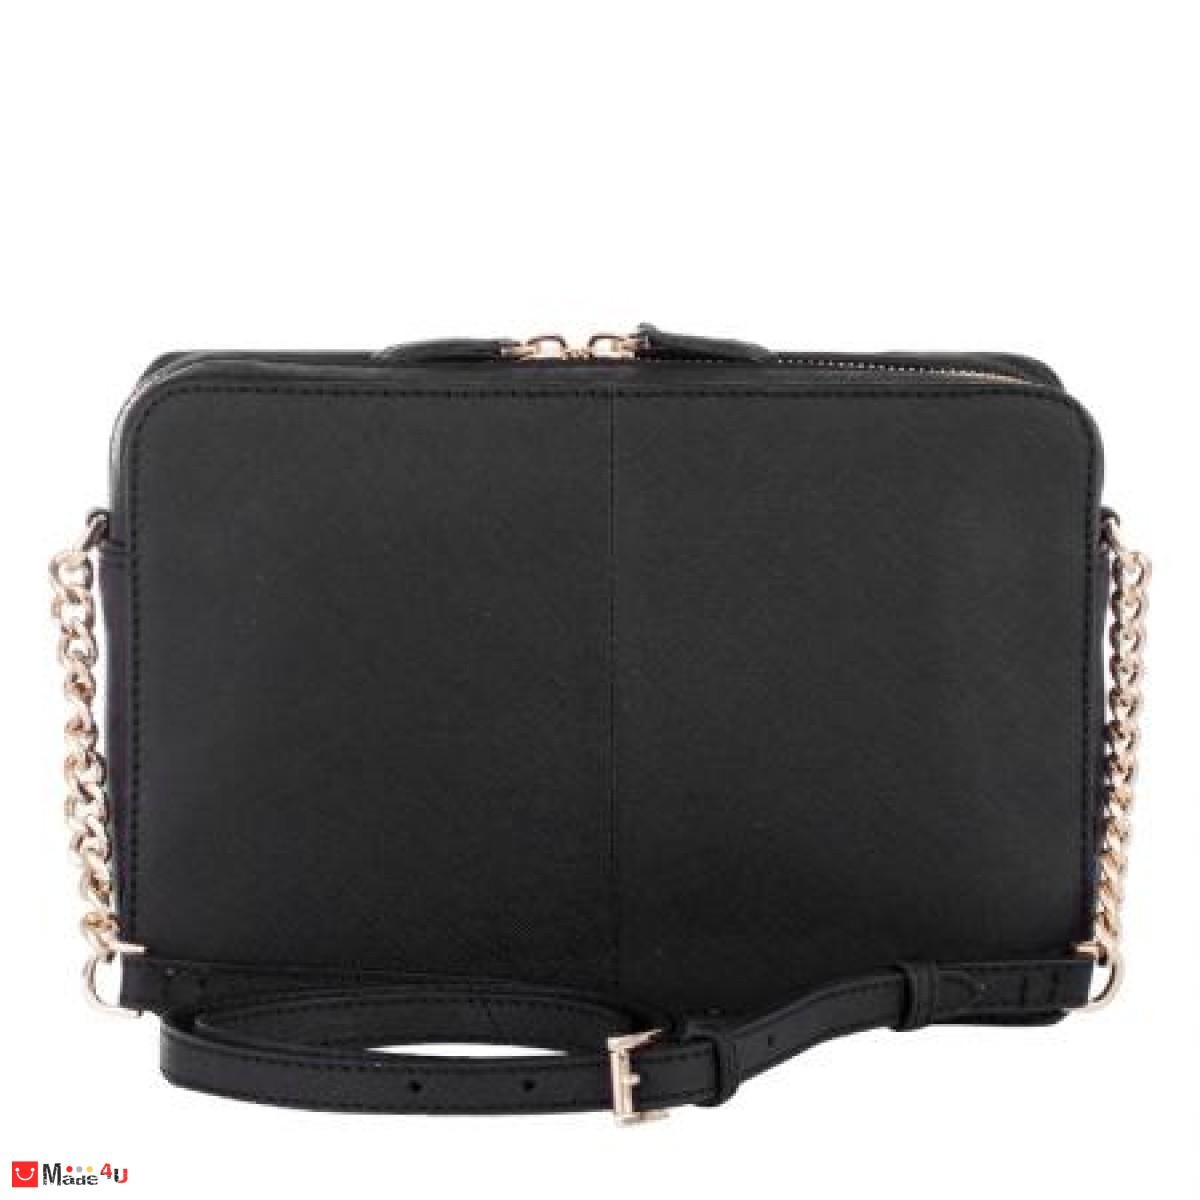 Дамска чанта през рамо 25х16см, черна